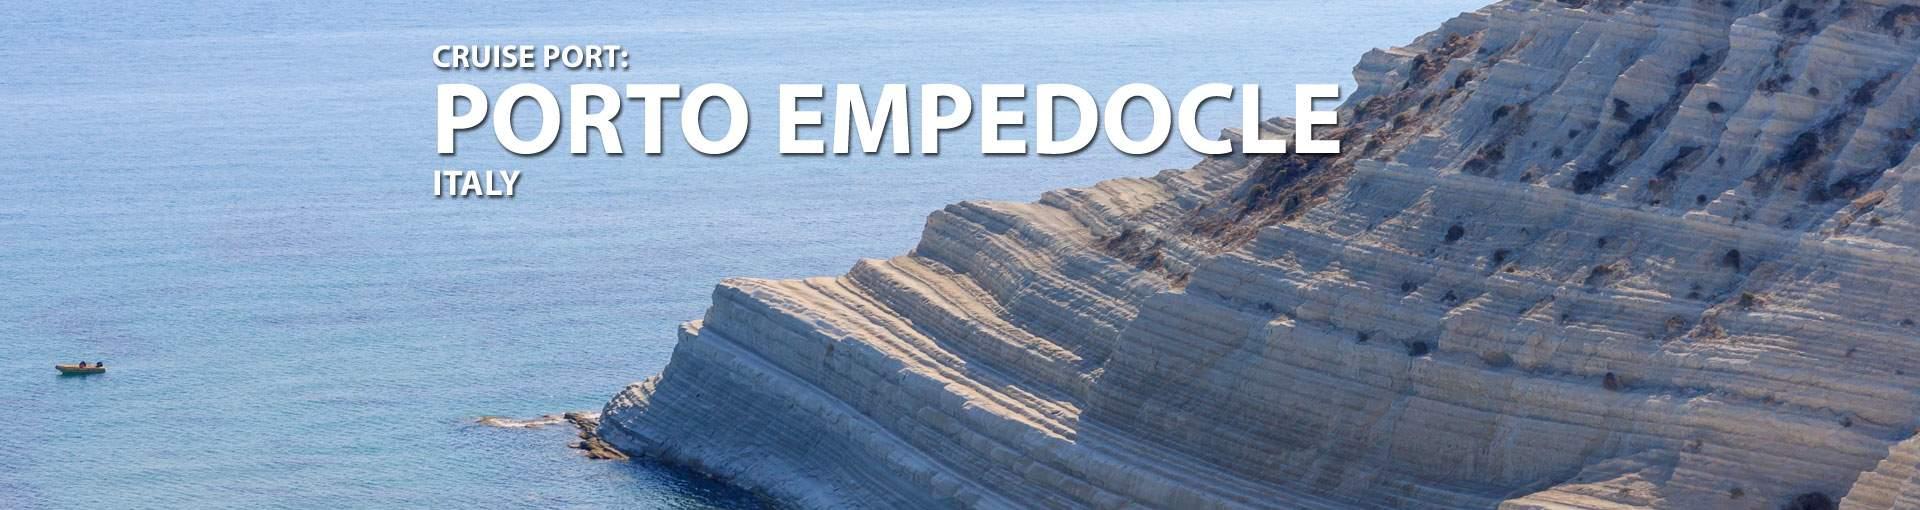 Cruises to Porto Empedocle, Italy